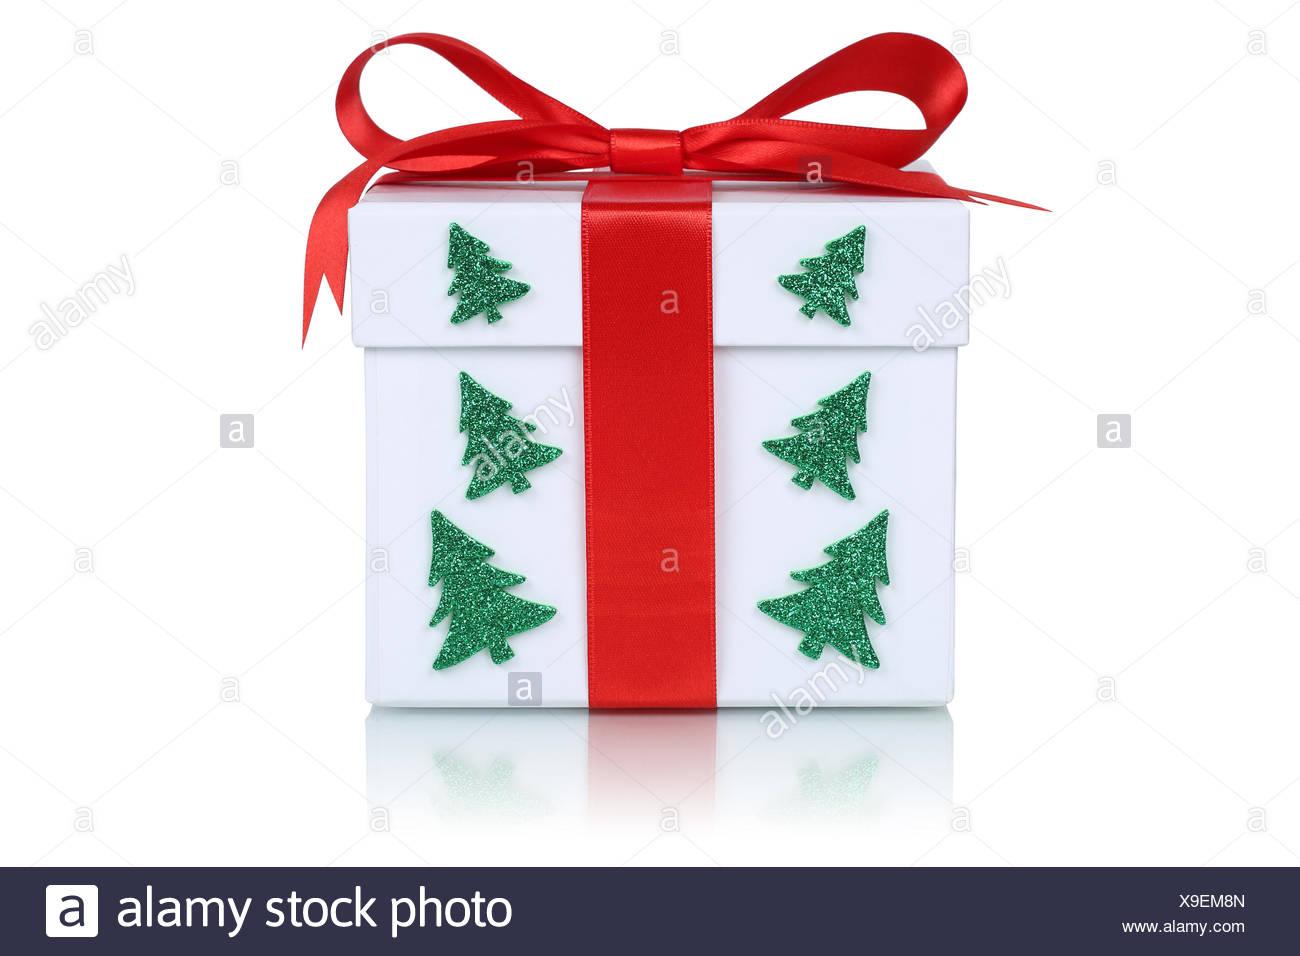 Weihnachtsgeschenk Weihnachten.Weihnachtsgeschenk Geschenk An Weihnachten Mit Tannenbaum Stock